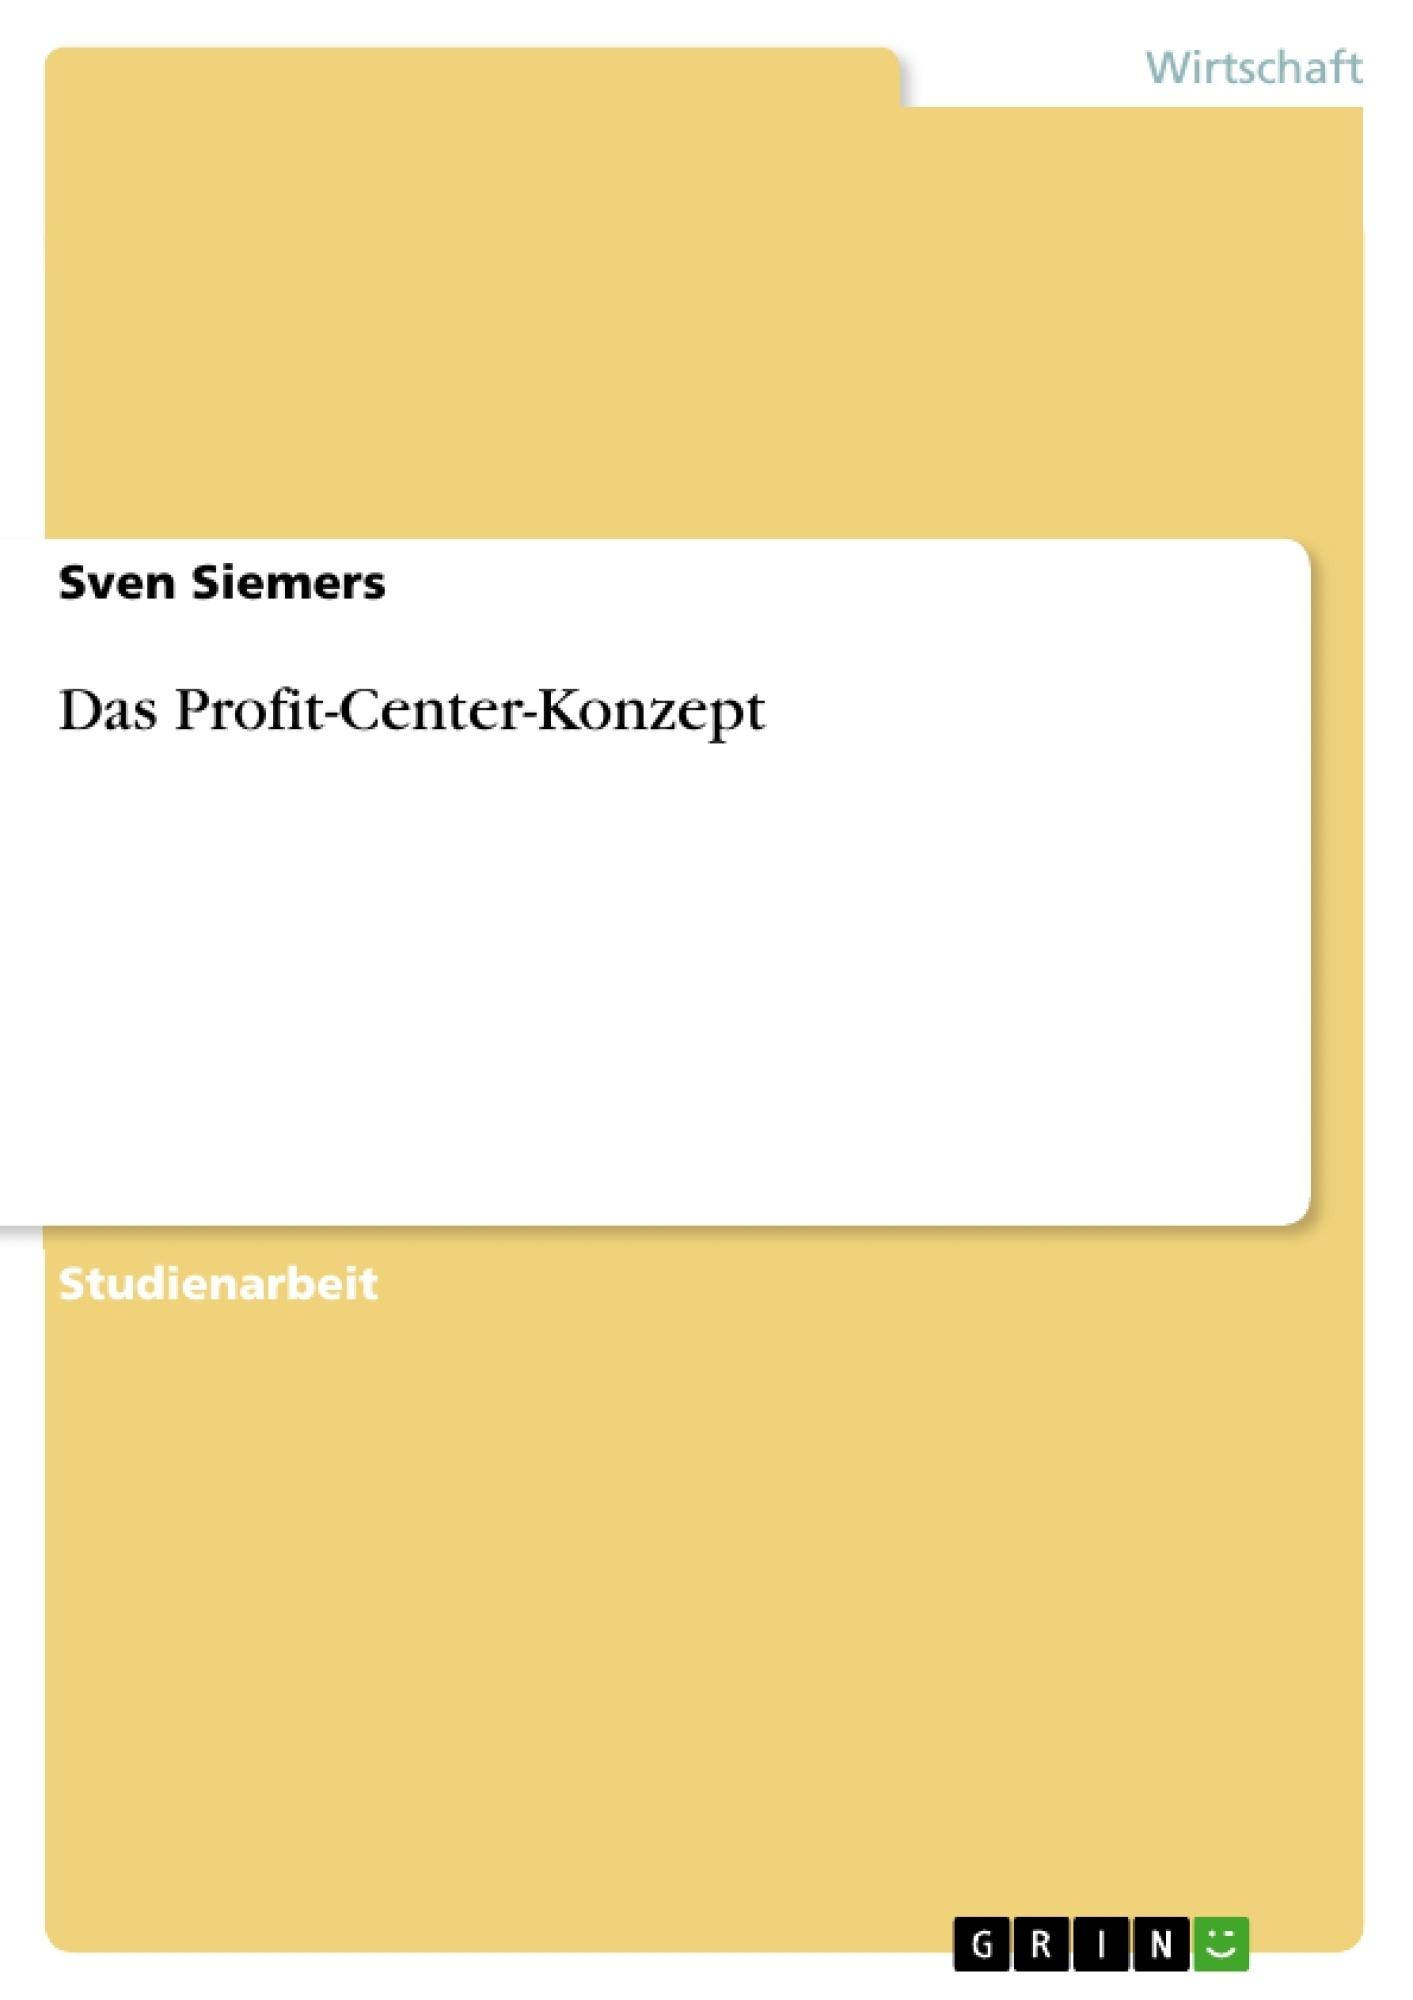 Titel: Das Profit-Center-Konzept